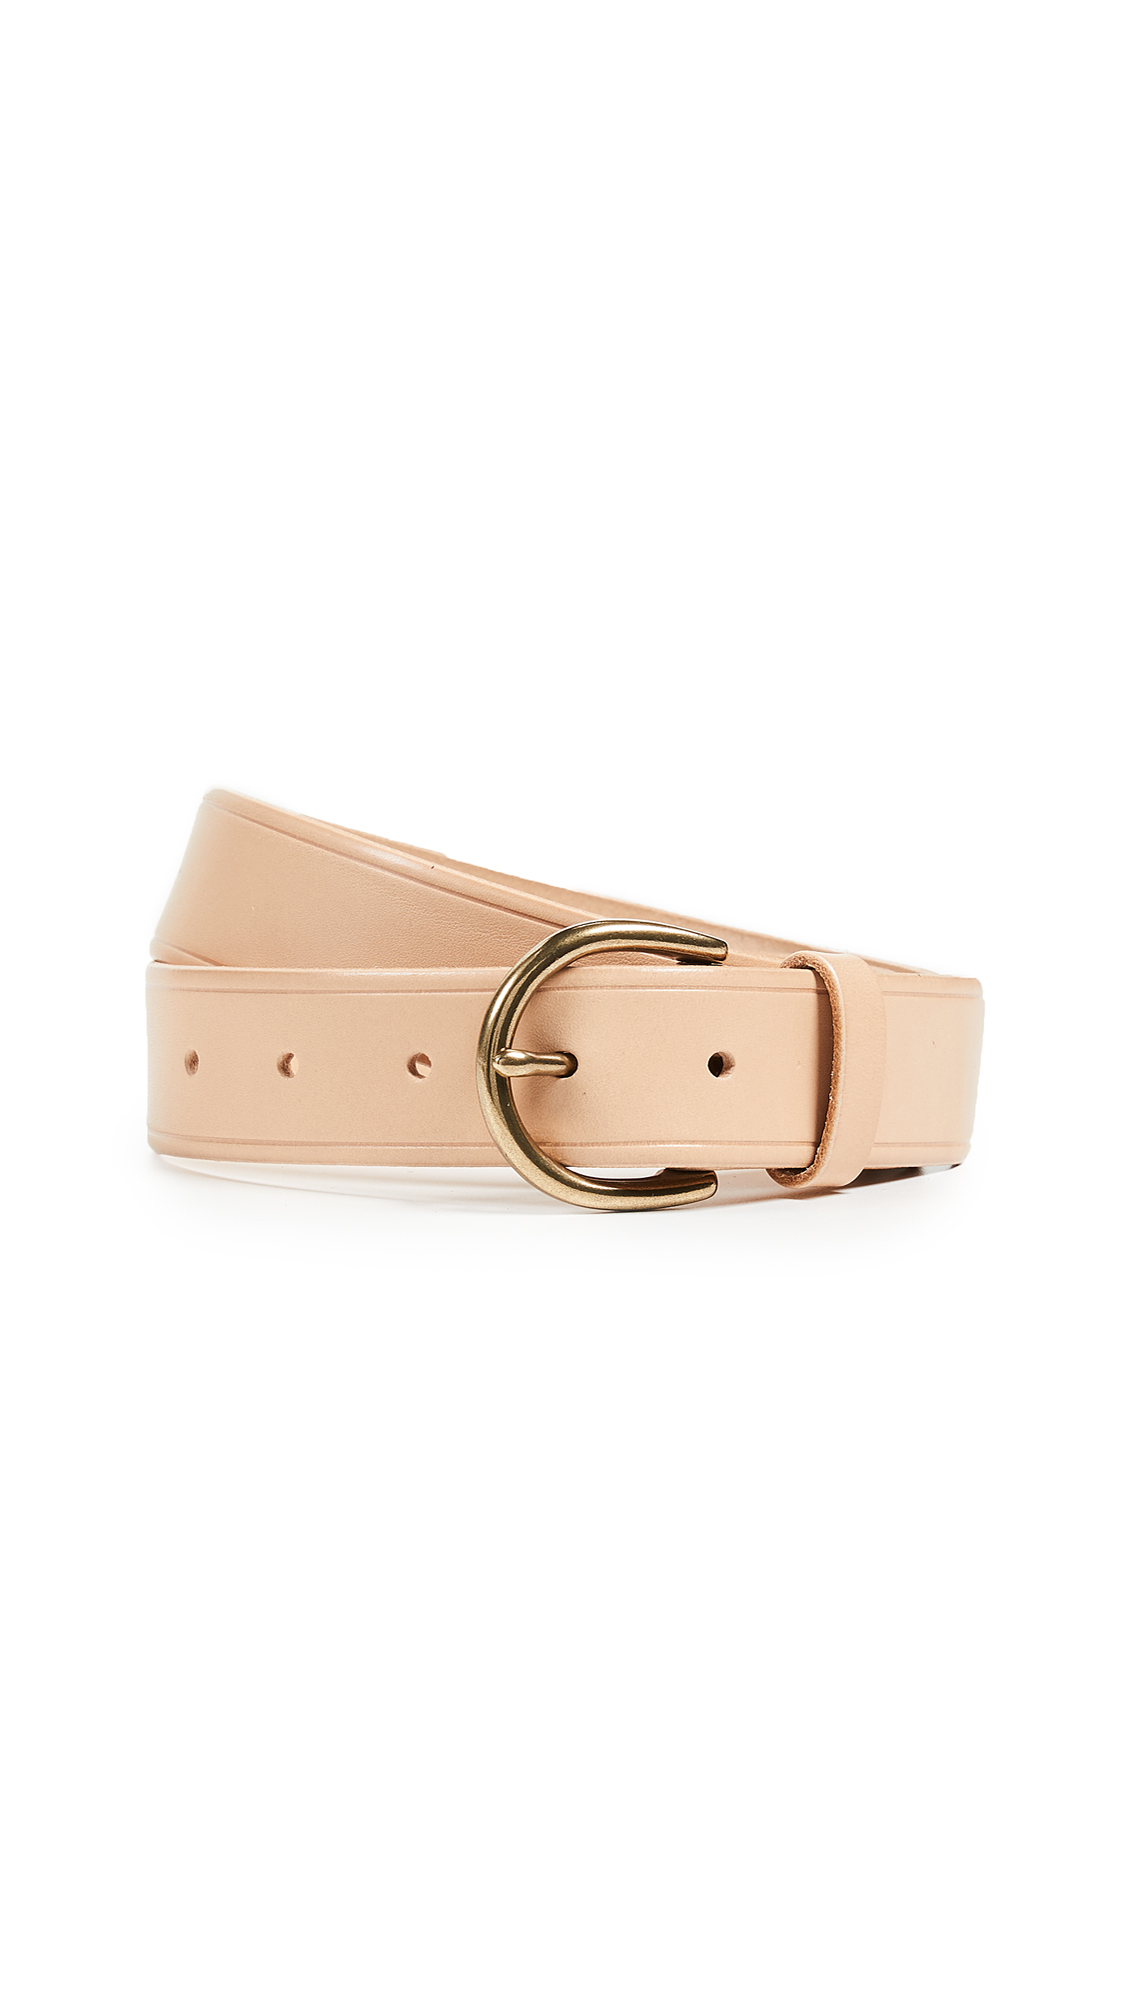 Madewell Medium Perfect Leather Belt - Linen